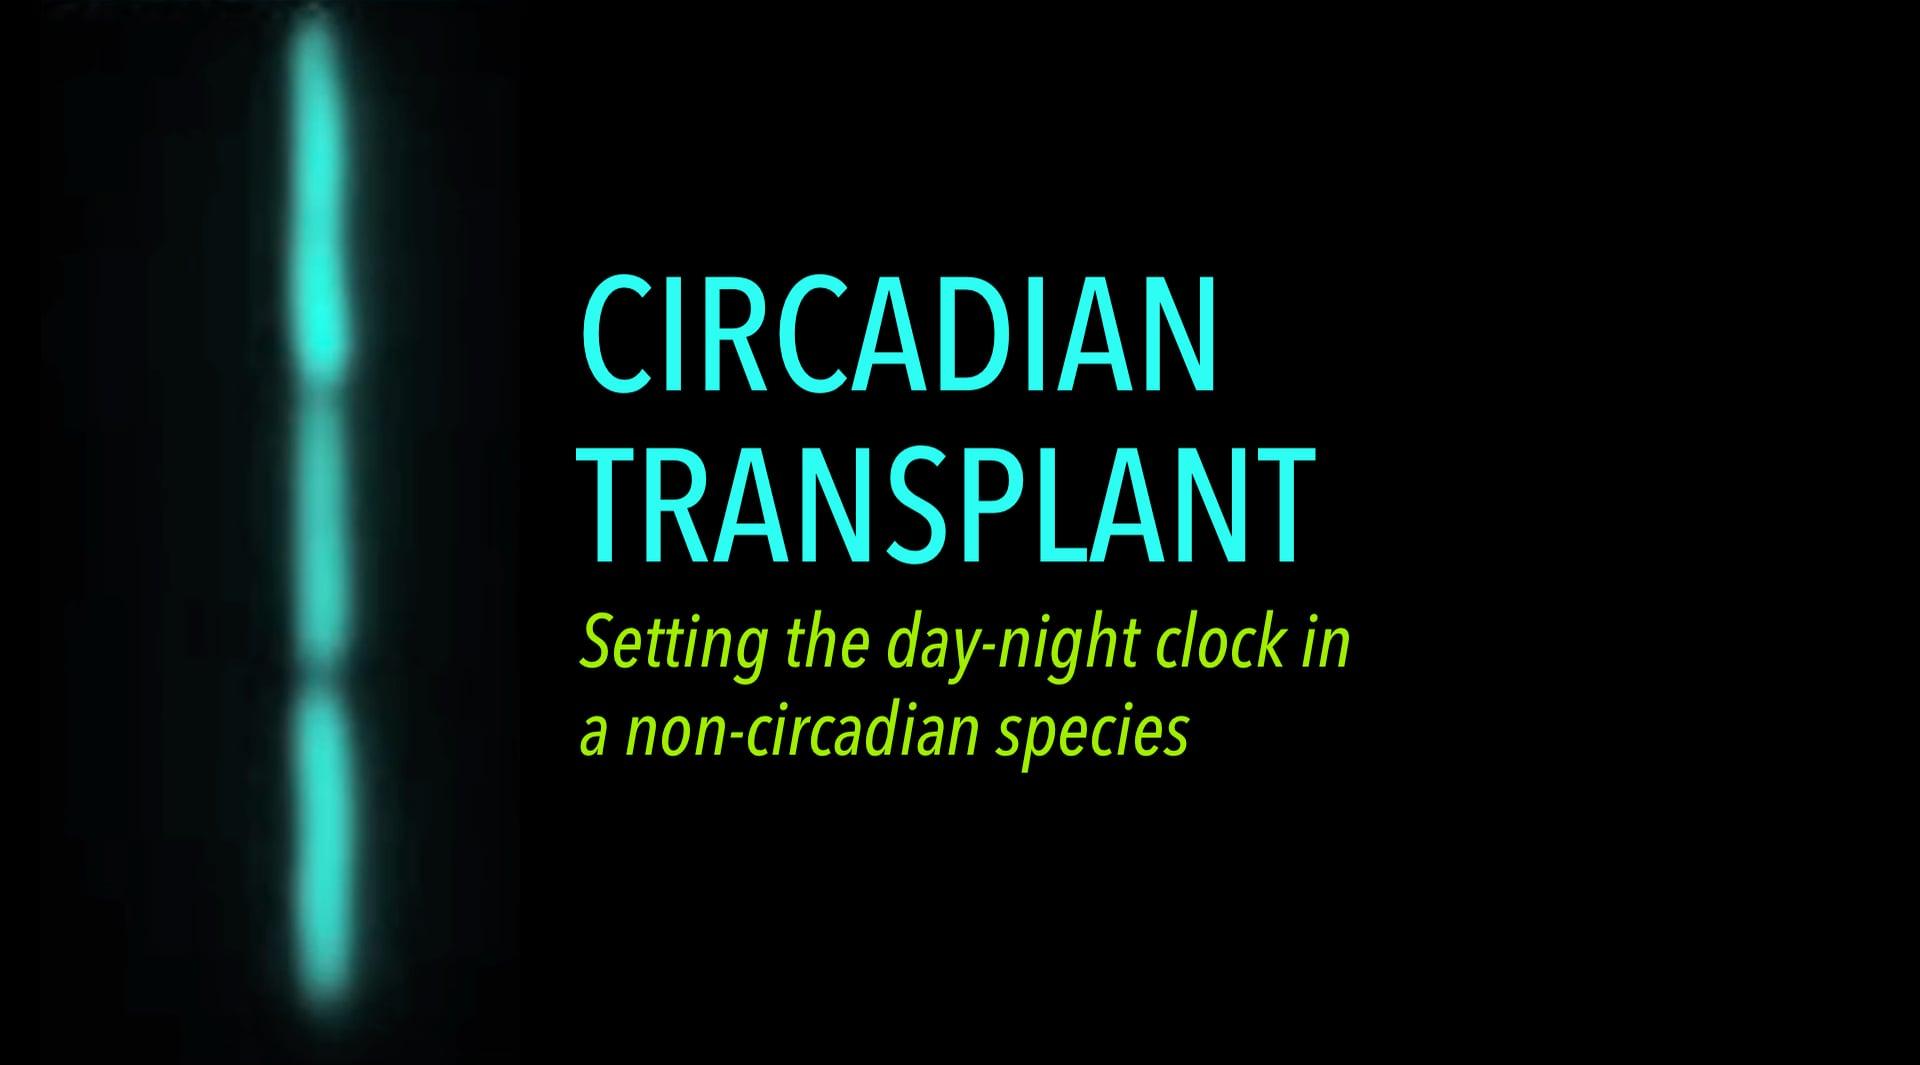 Circadian Transplant